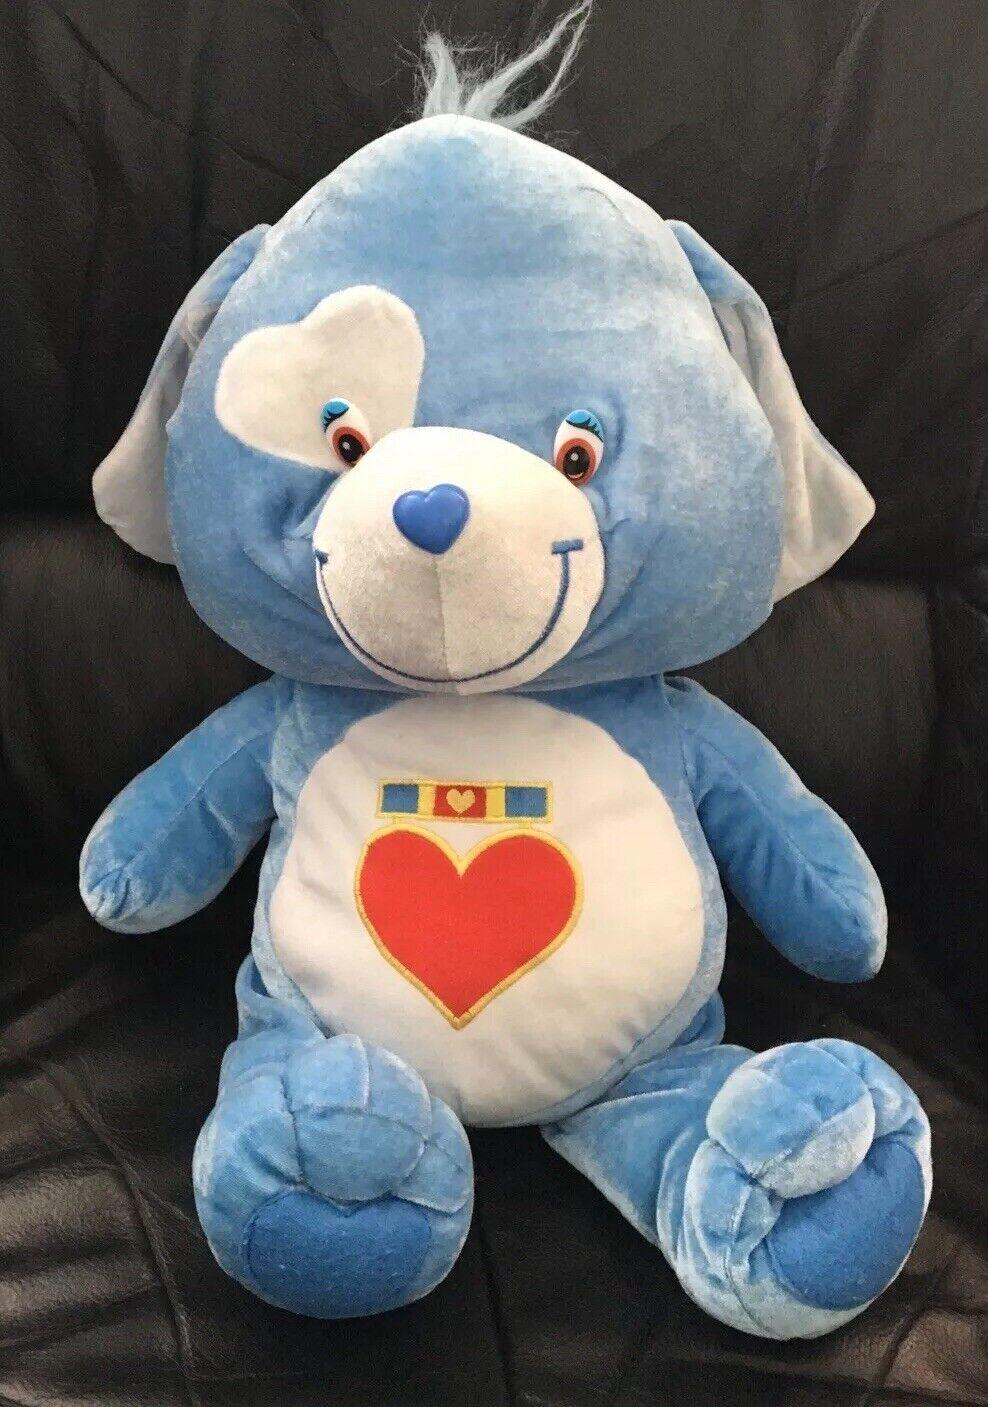 Large Care bear cousins Loyal heart Blau dog Cuddly soft toy